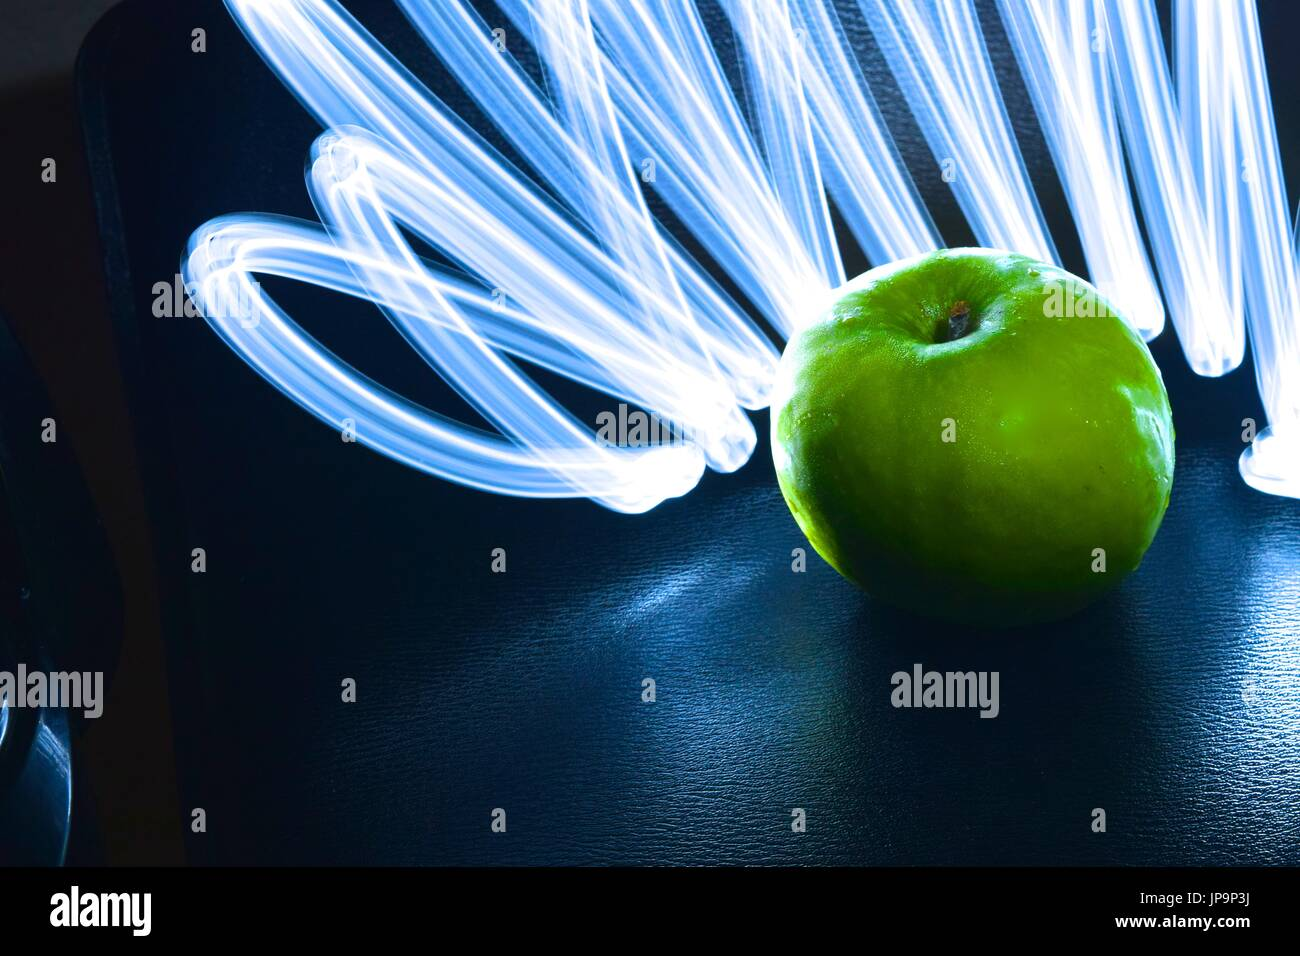 Green Apple Geometric Shape Stock Photos Green Apple Geometric - Fruit provides light for long exposure photographs